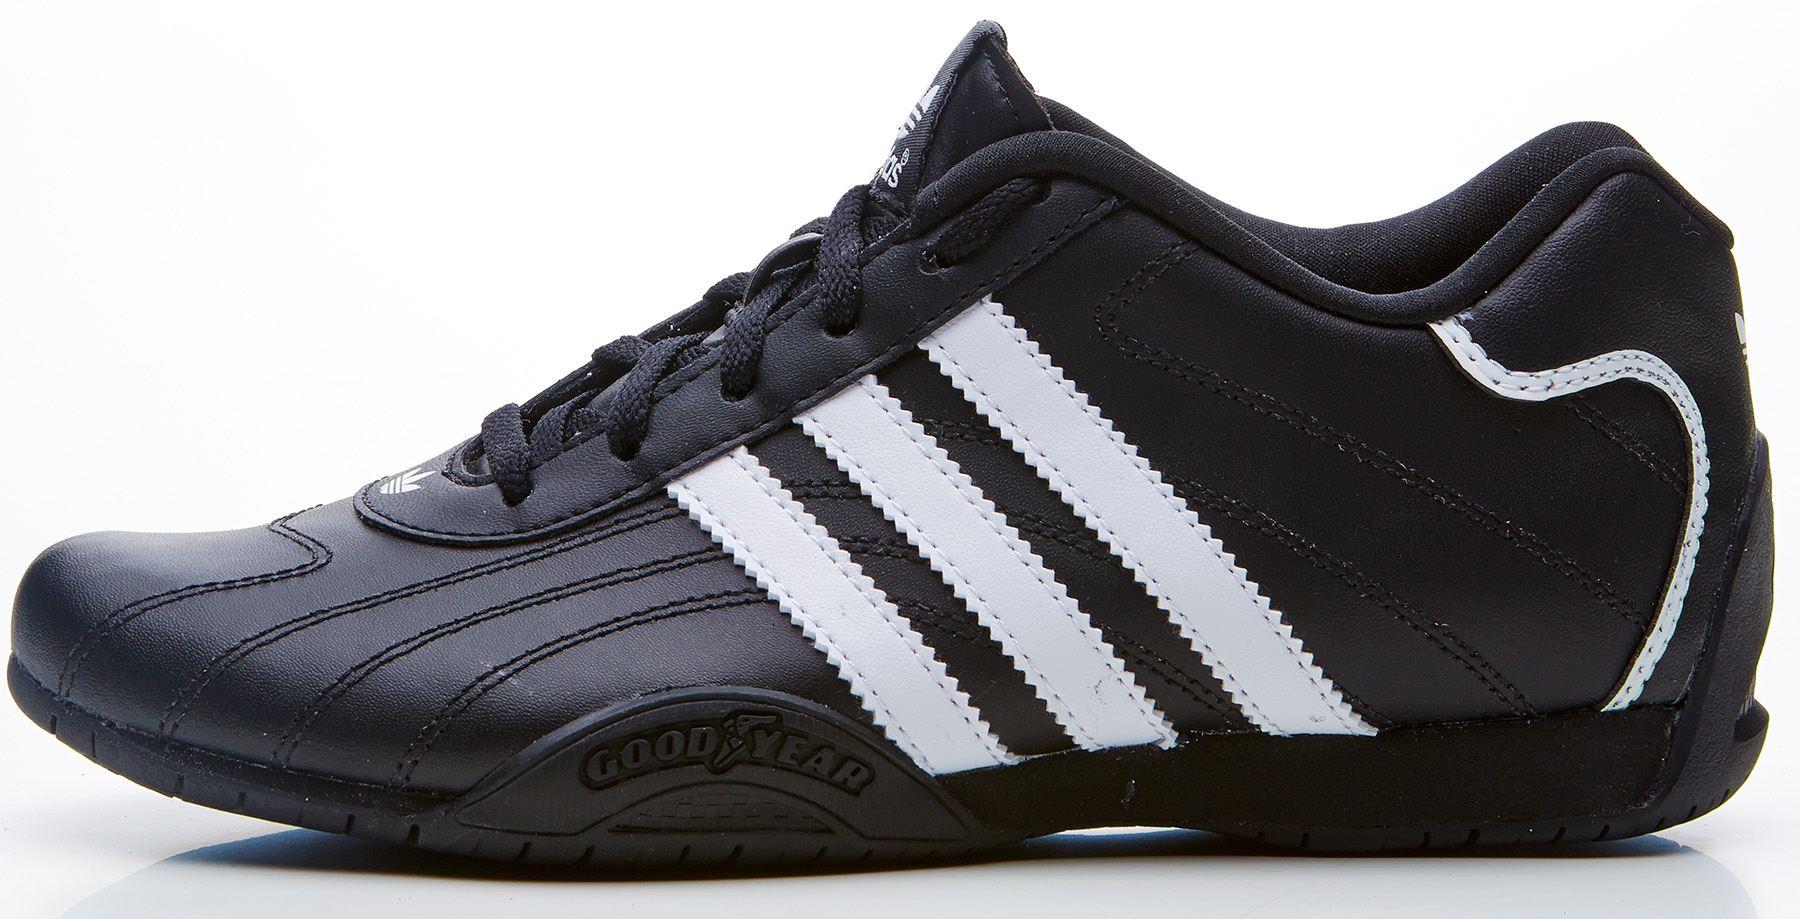 adidas-Originals-goodyear-adi-racer-kids-GS-trainers-